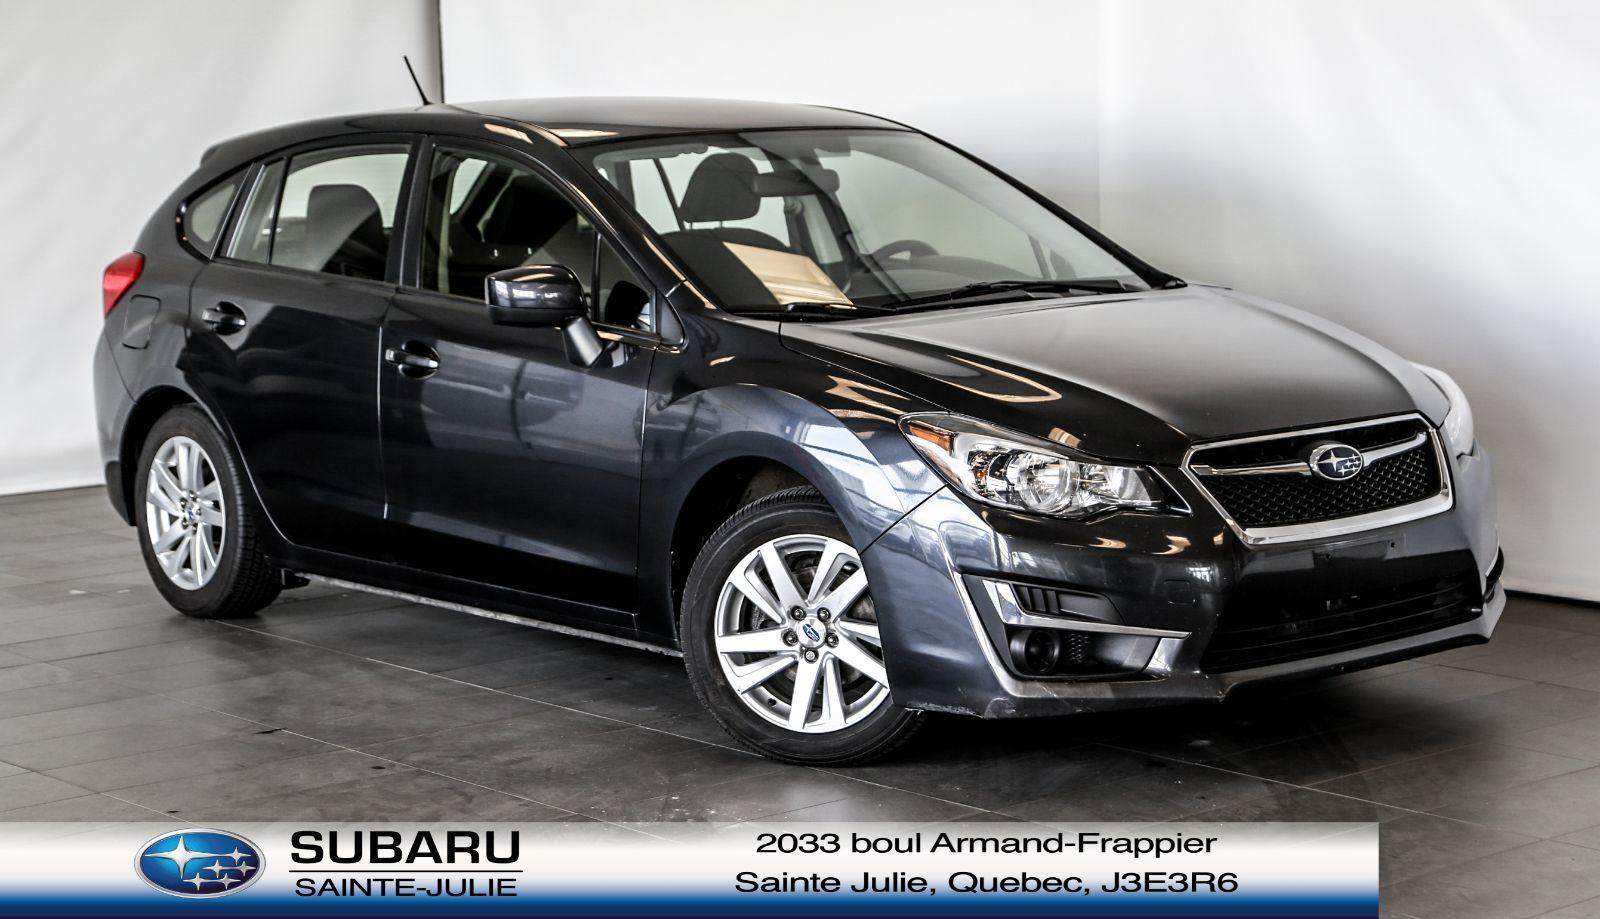 Used 2016 Subaru Impreza 2 0i W Touring Pkg At Subaru Sainte Julie 17 995